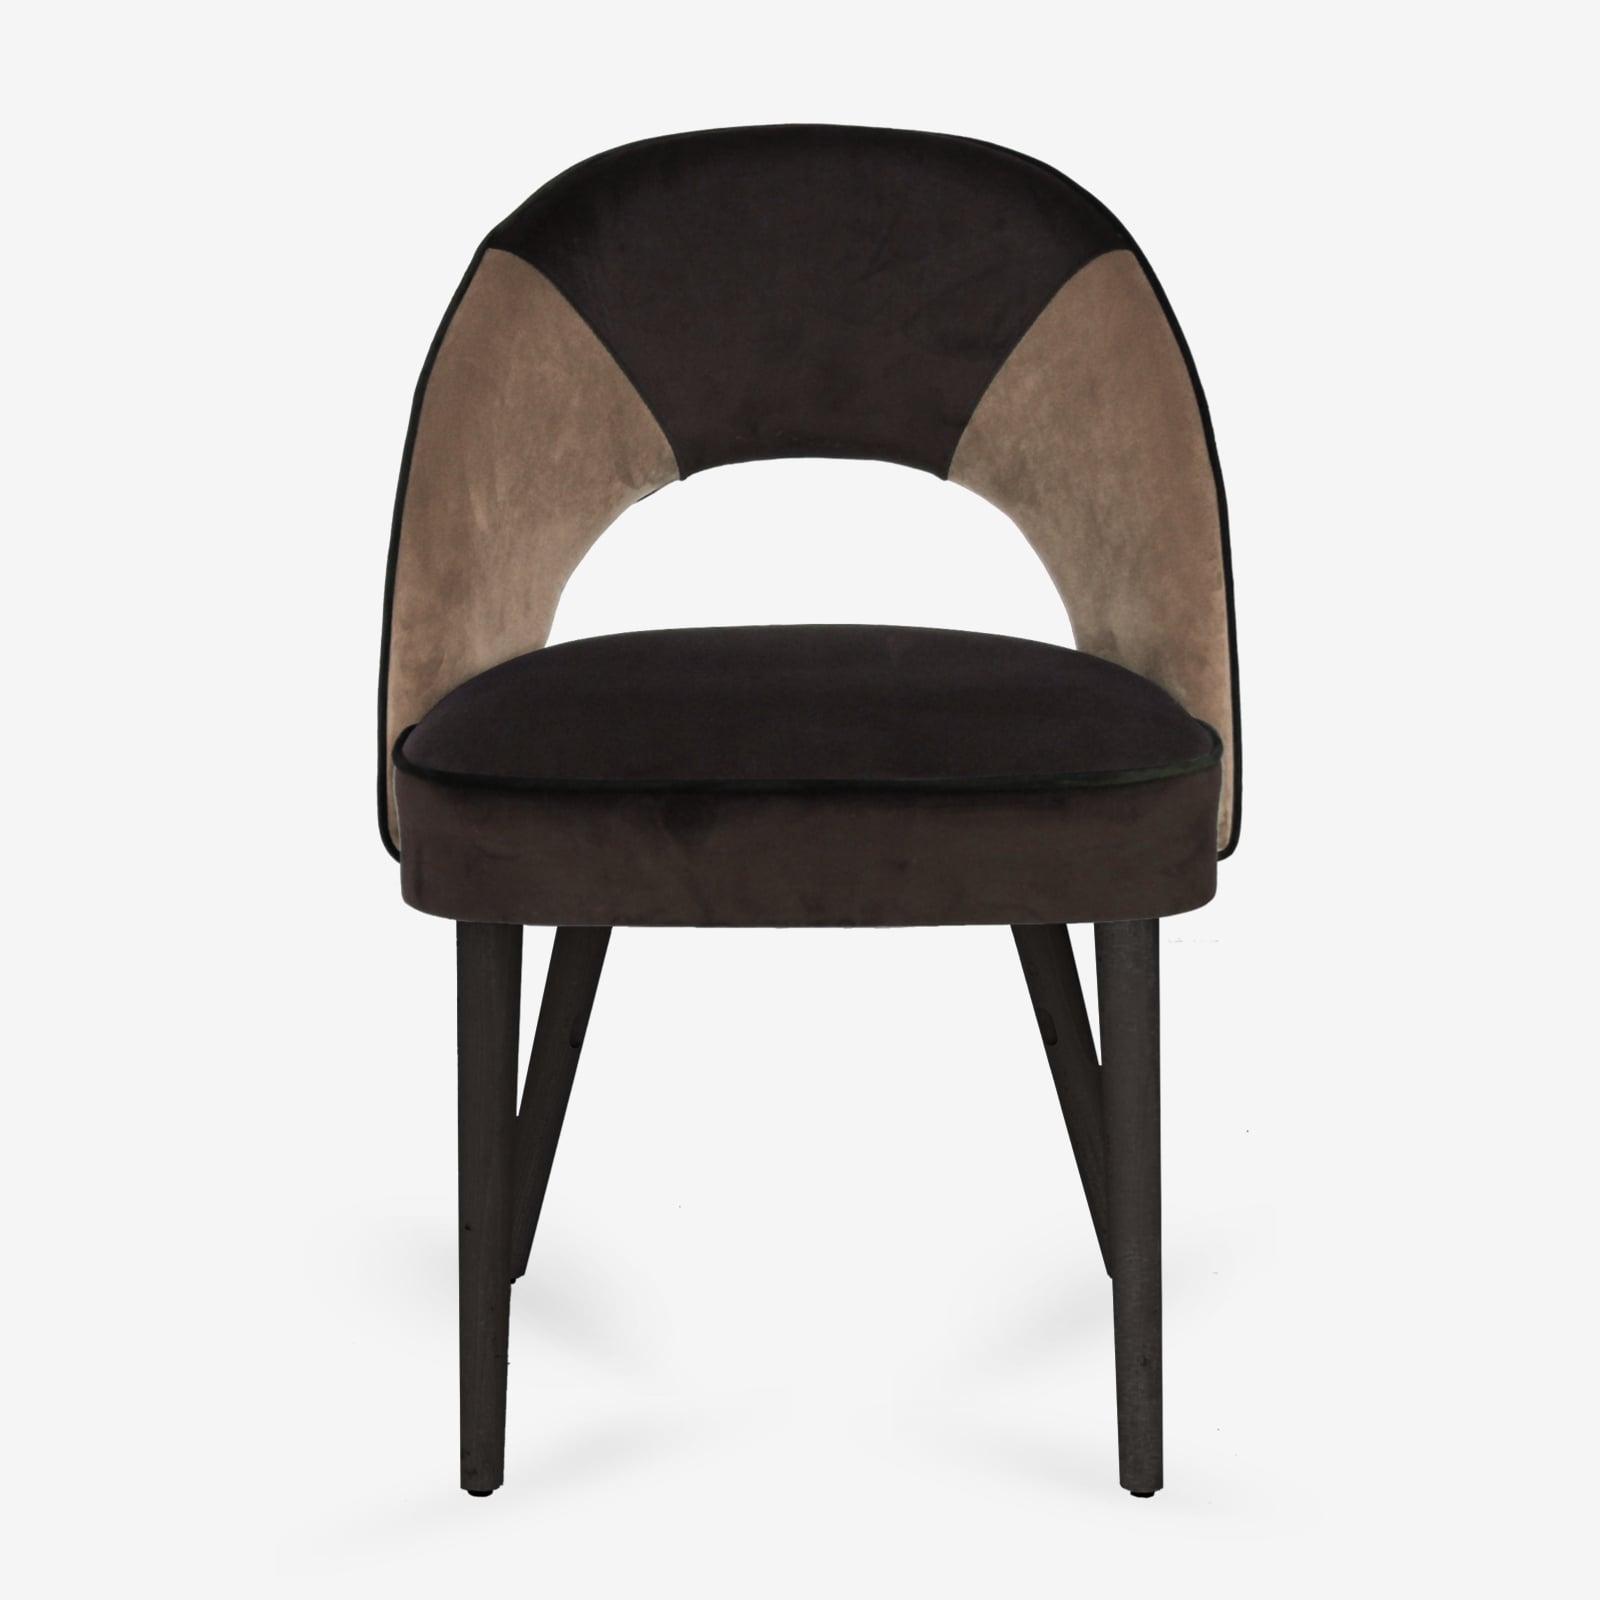 Sedie-in-velluto-sedie-vintage-sedie-moderne-sedie-per-arredamento-contract-sedie-per-ristoranti-alberghi-hotel-agriturismi-uffici-negozi-mar-f